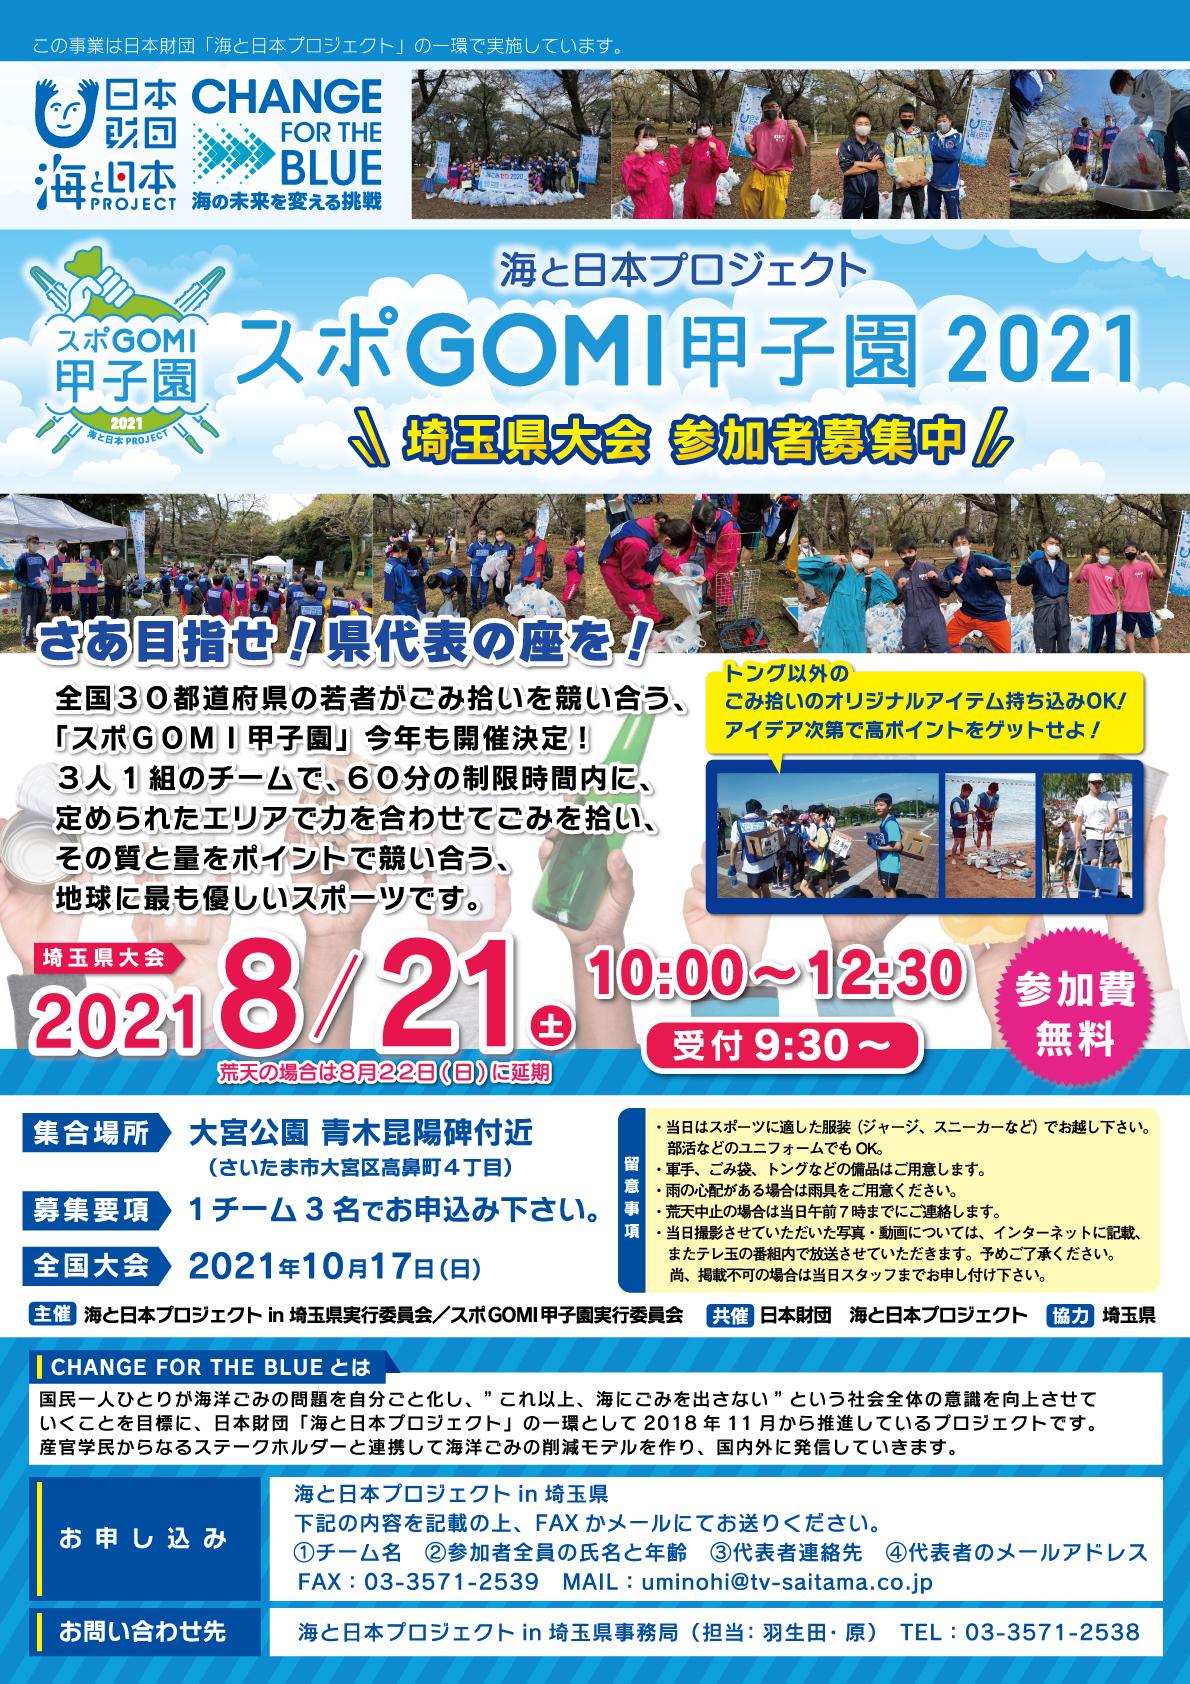 【スポGOMI甲子園埼玉県大会2021_表】